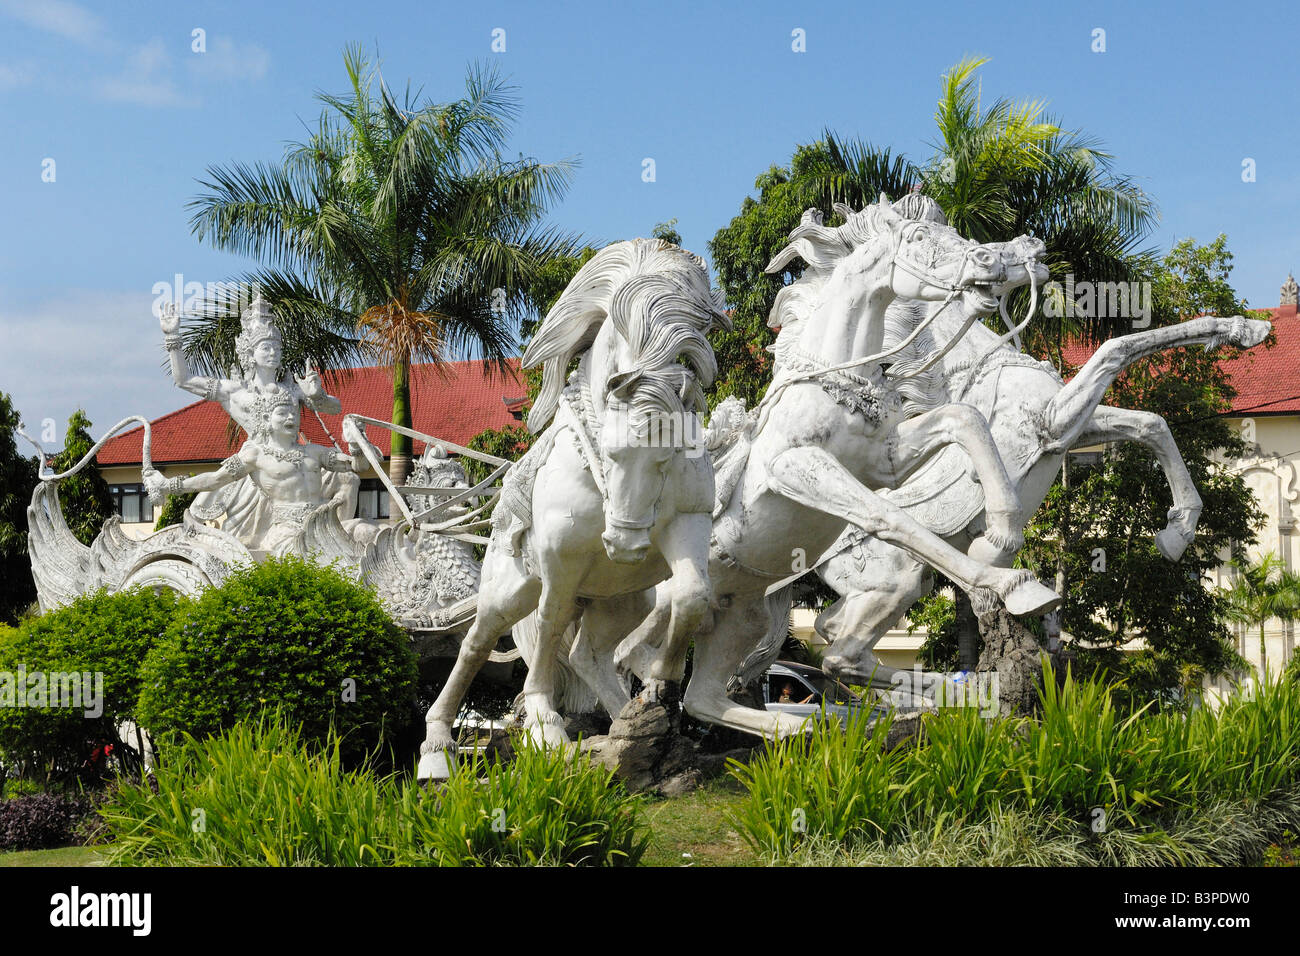 Statues from Balinese mythology in Gianyar, Bali, Indonesia - Stock Image